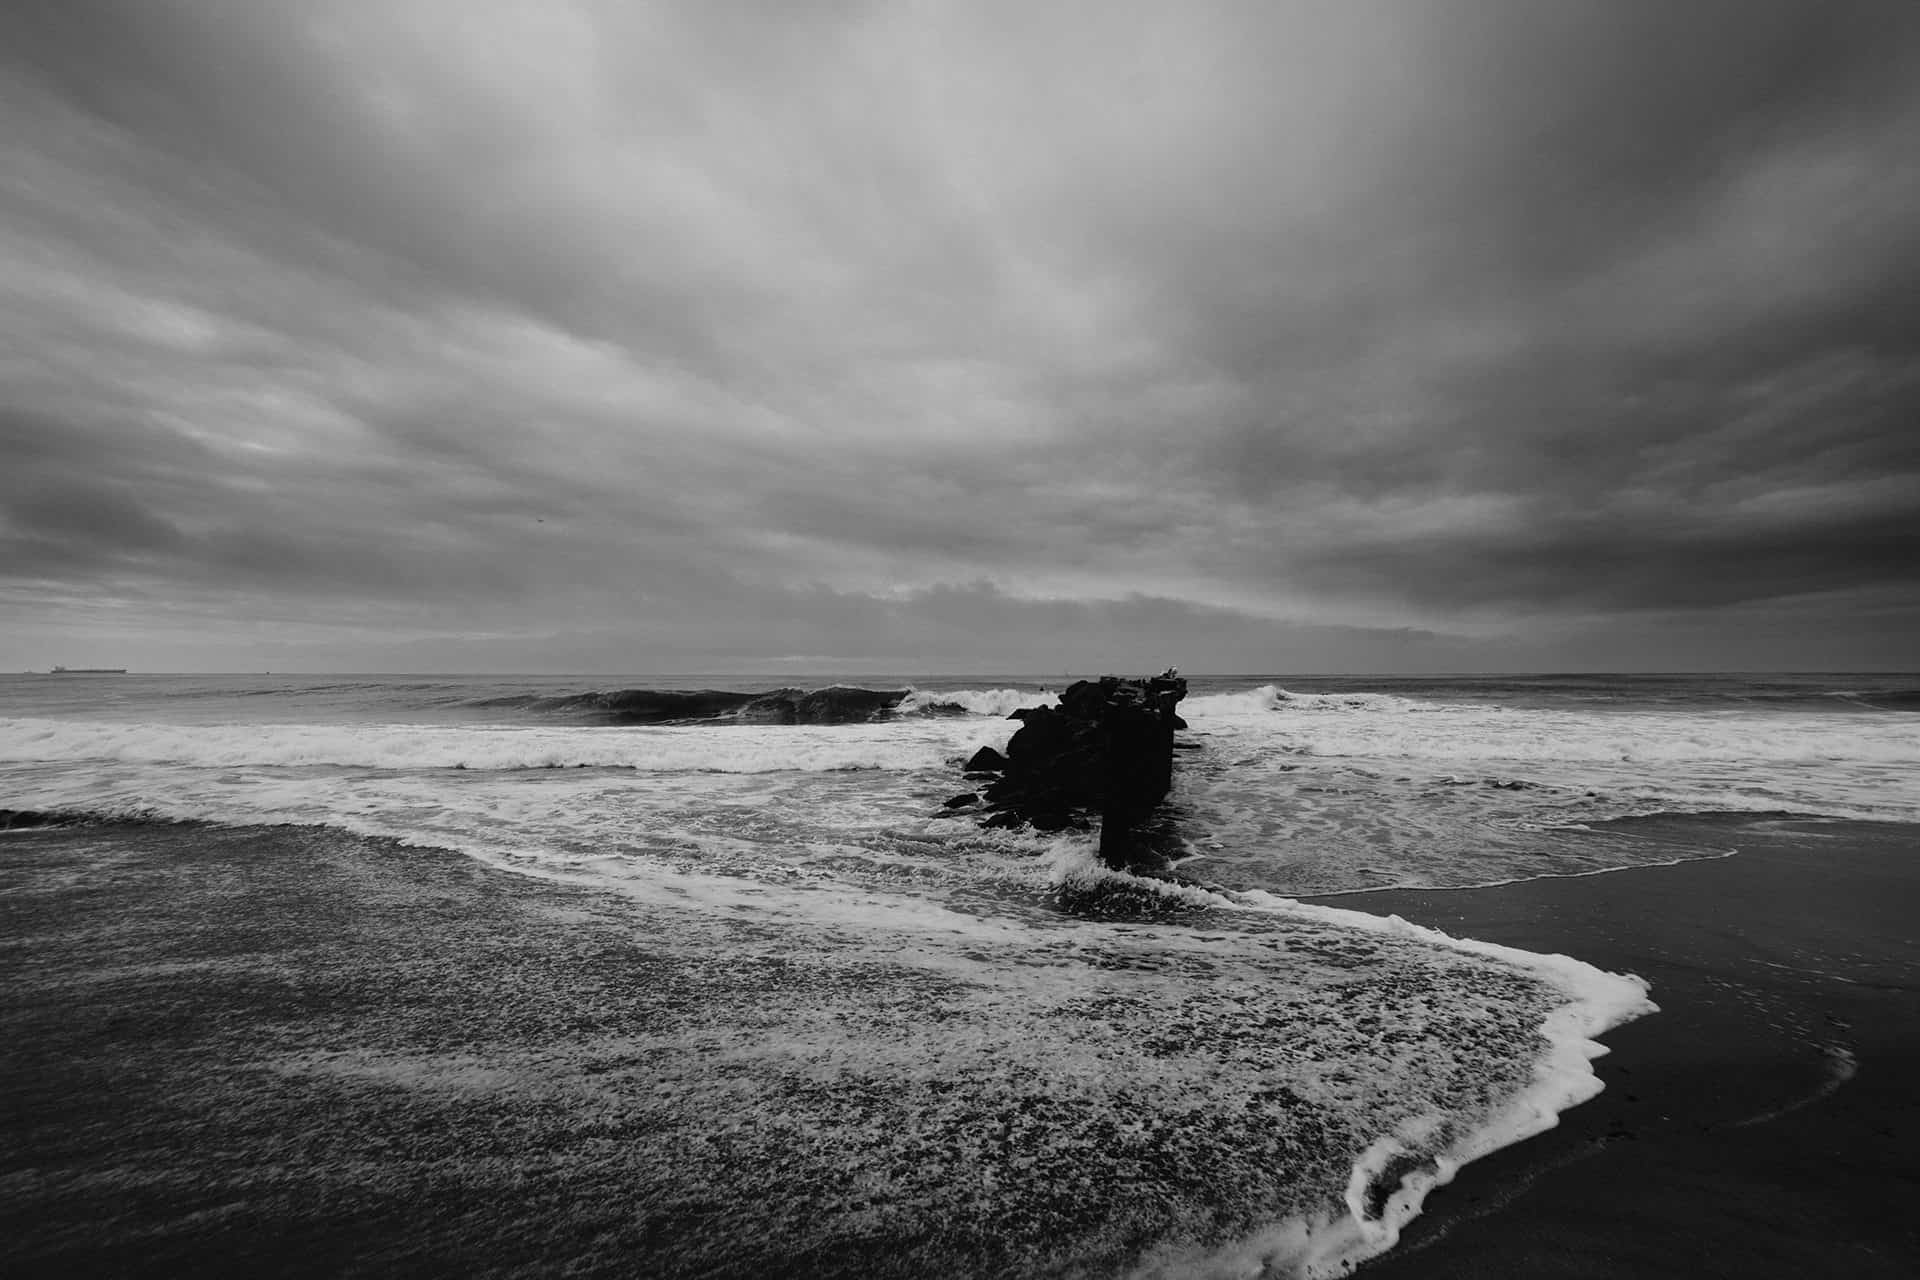 Sturm dunkle Wolken Meer Unwetter